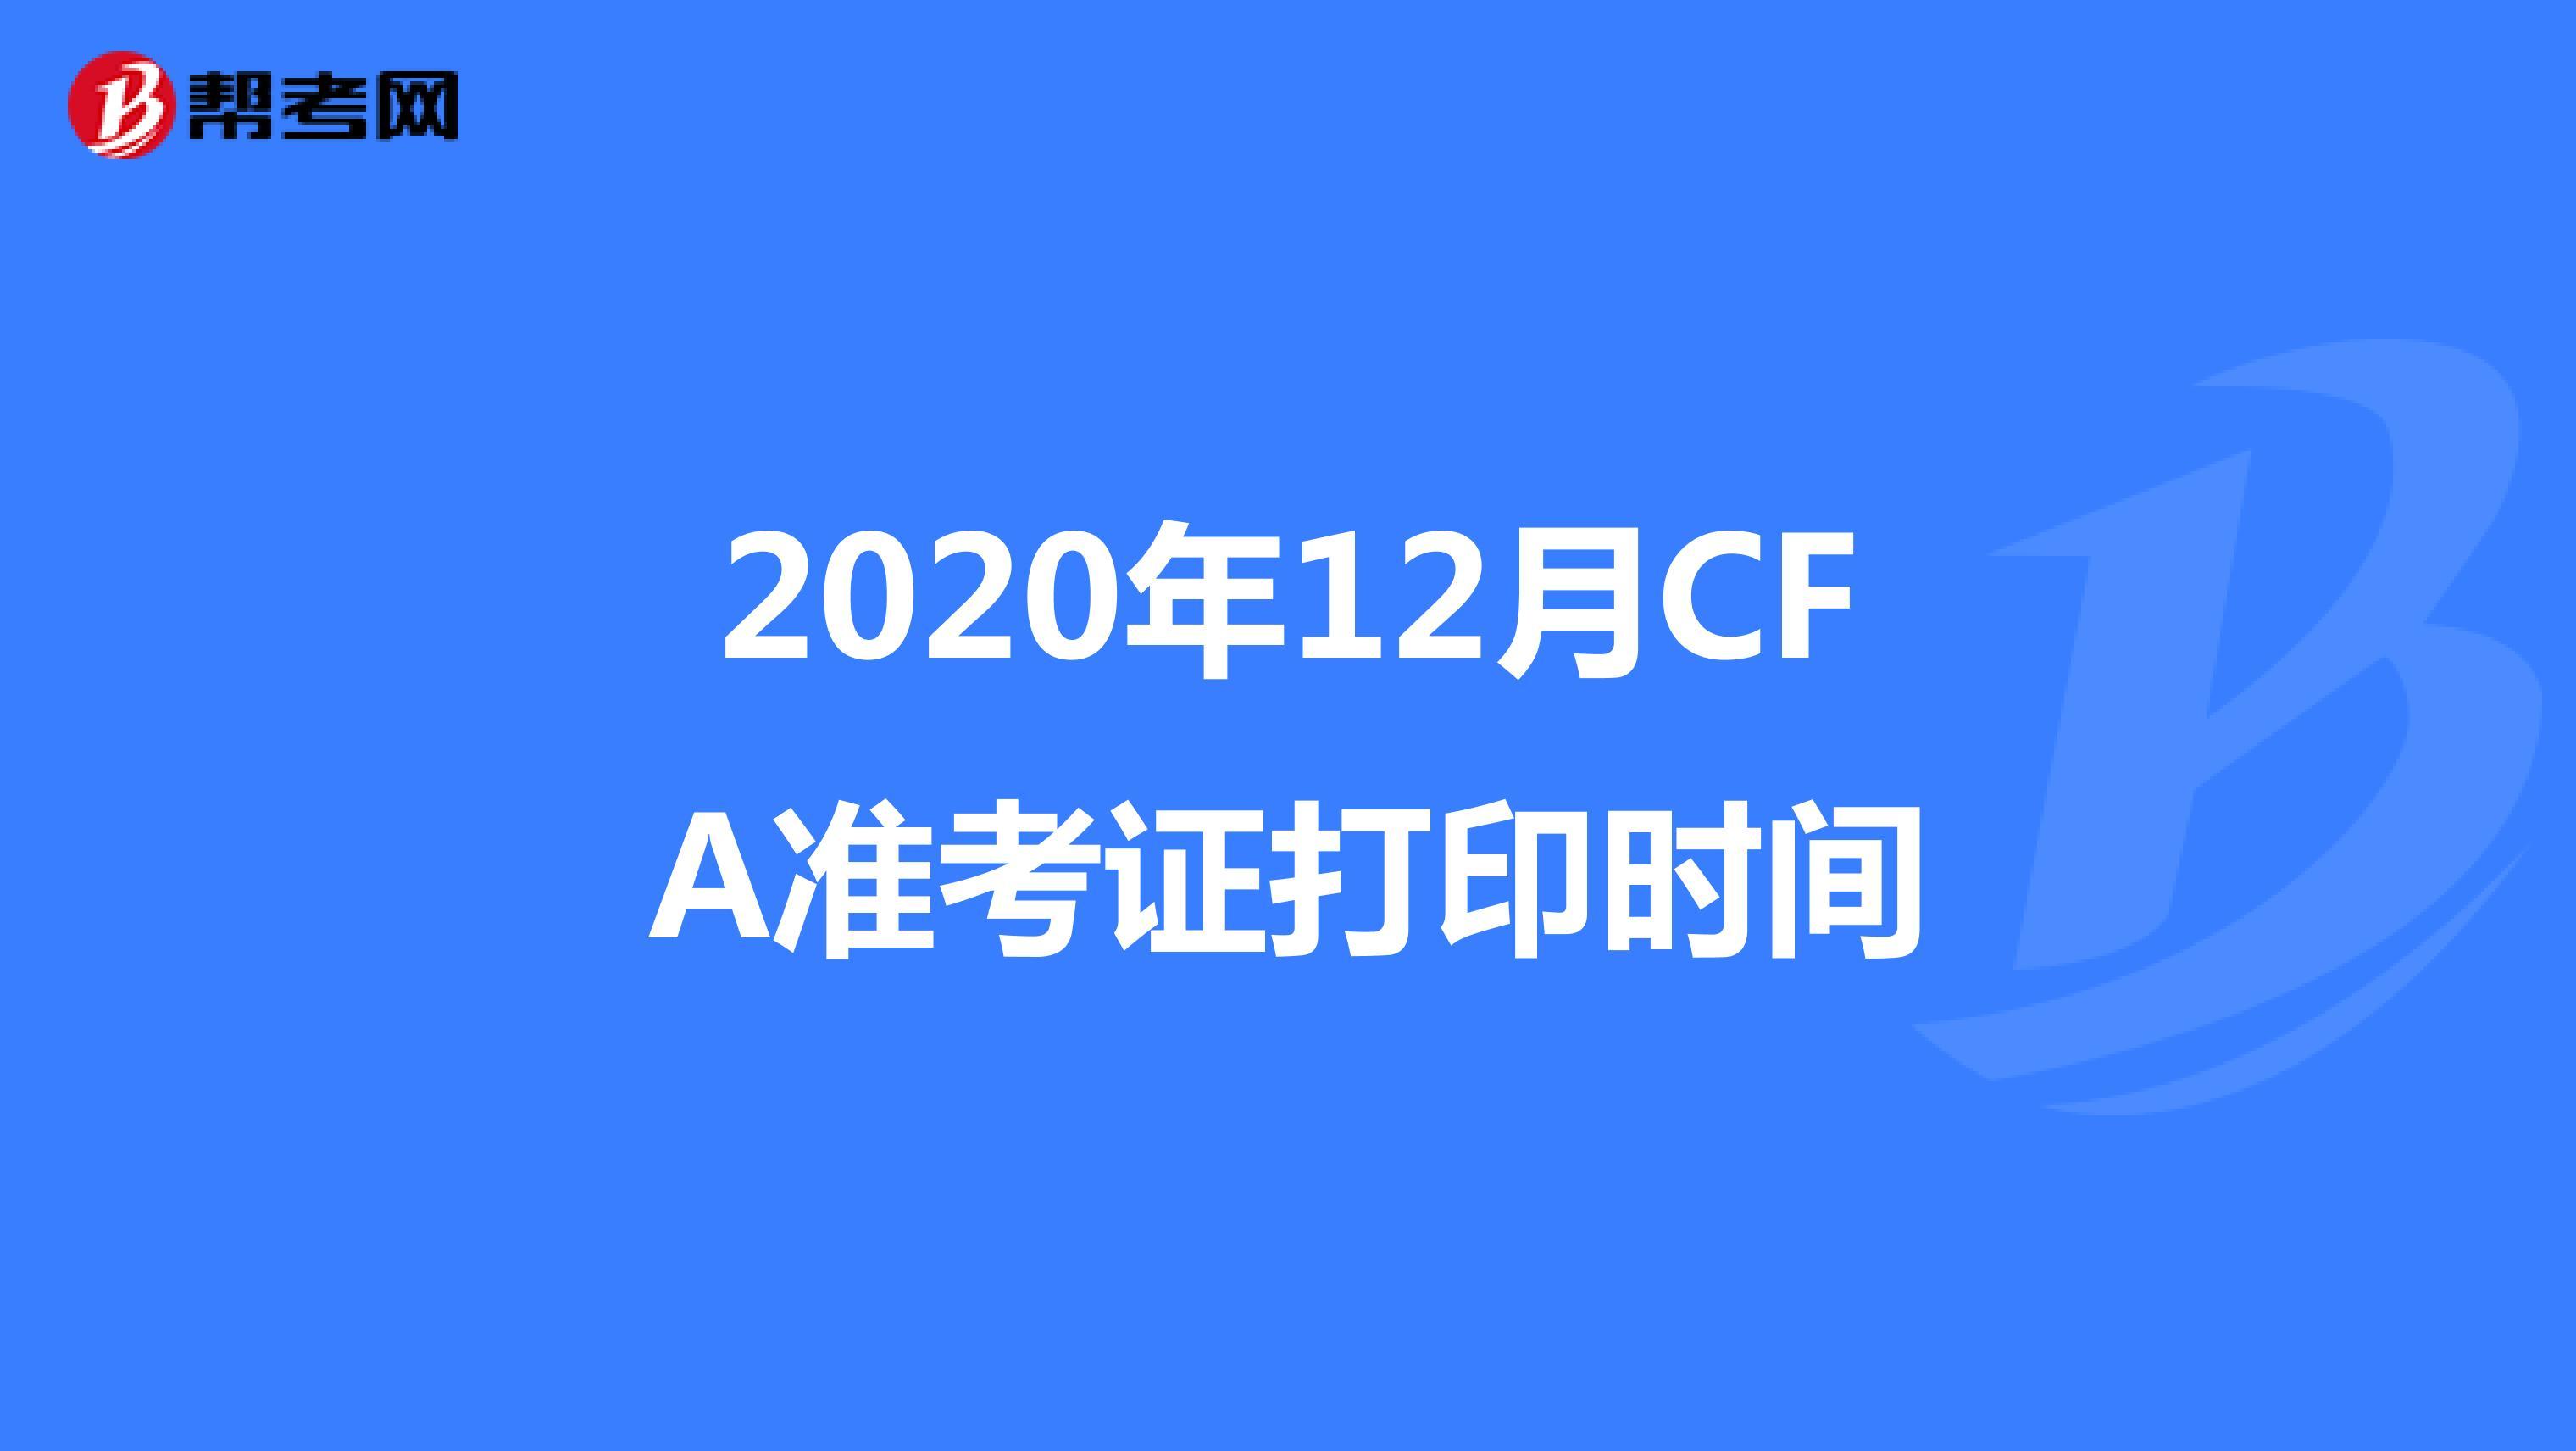 2020年12月CFA准考证打印时间